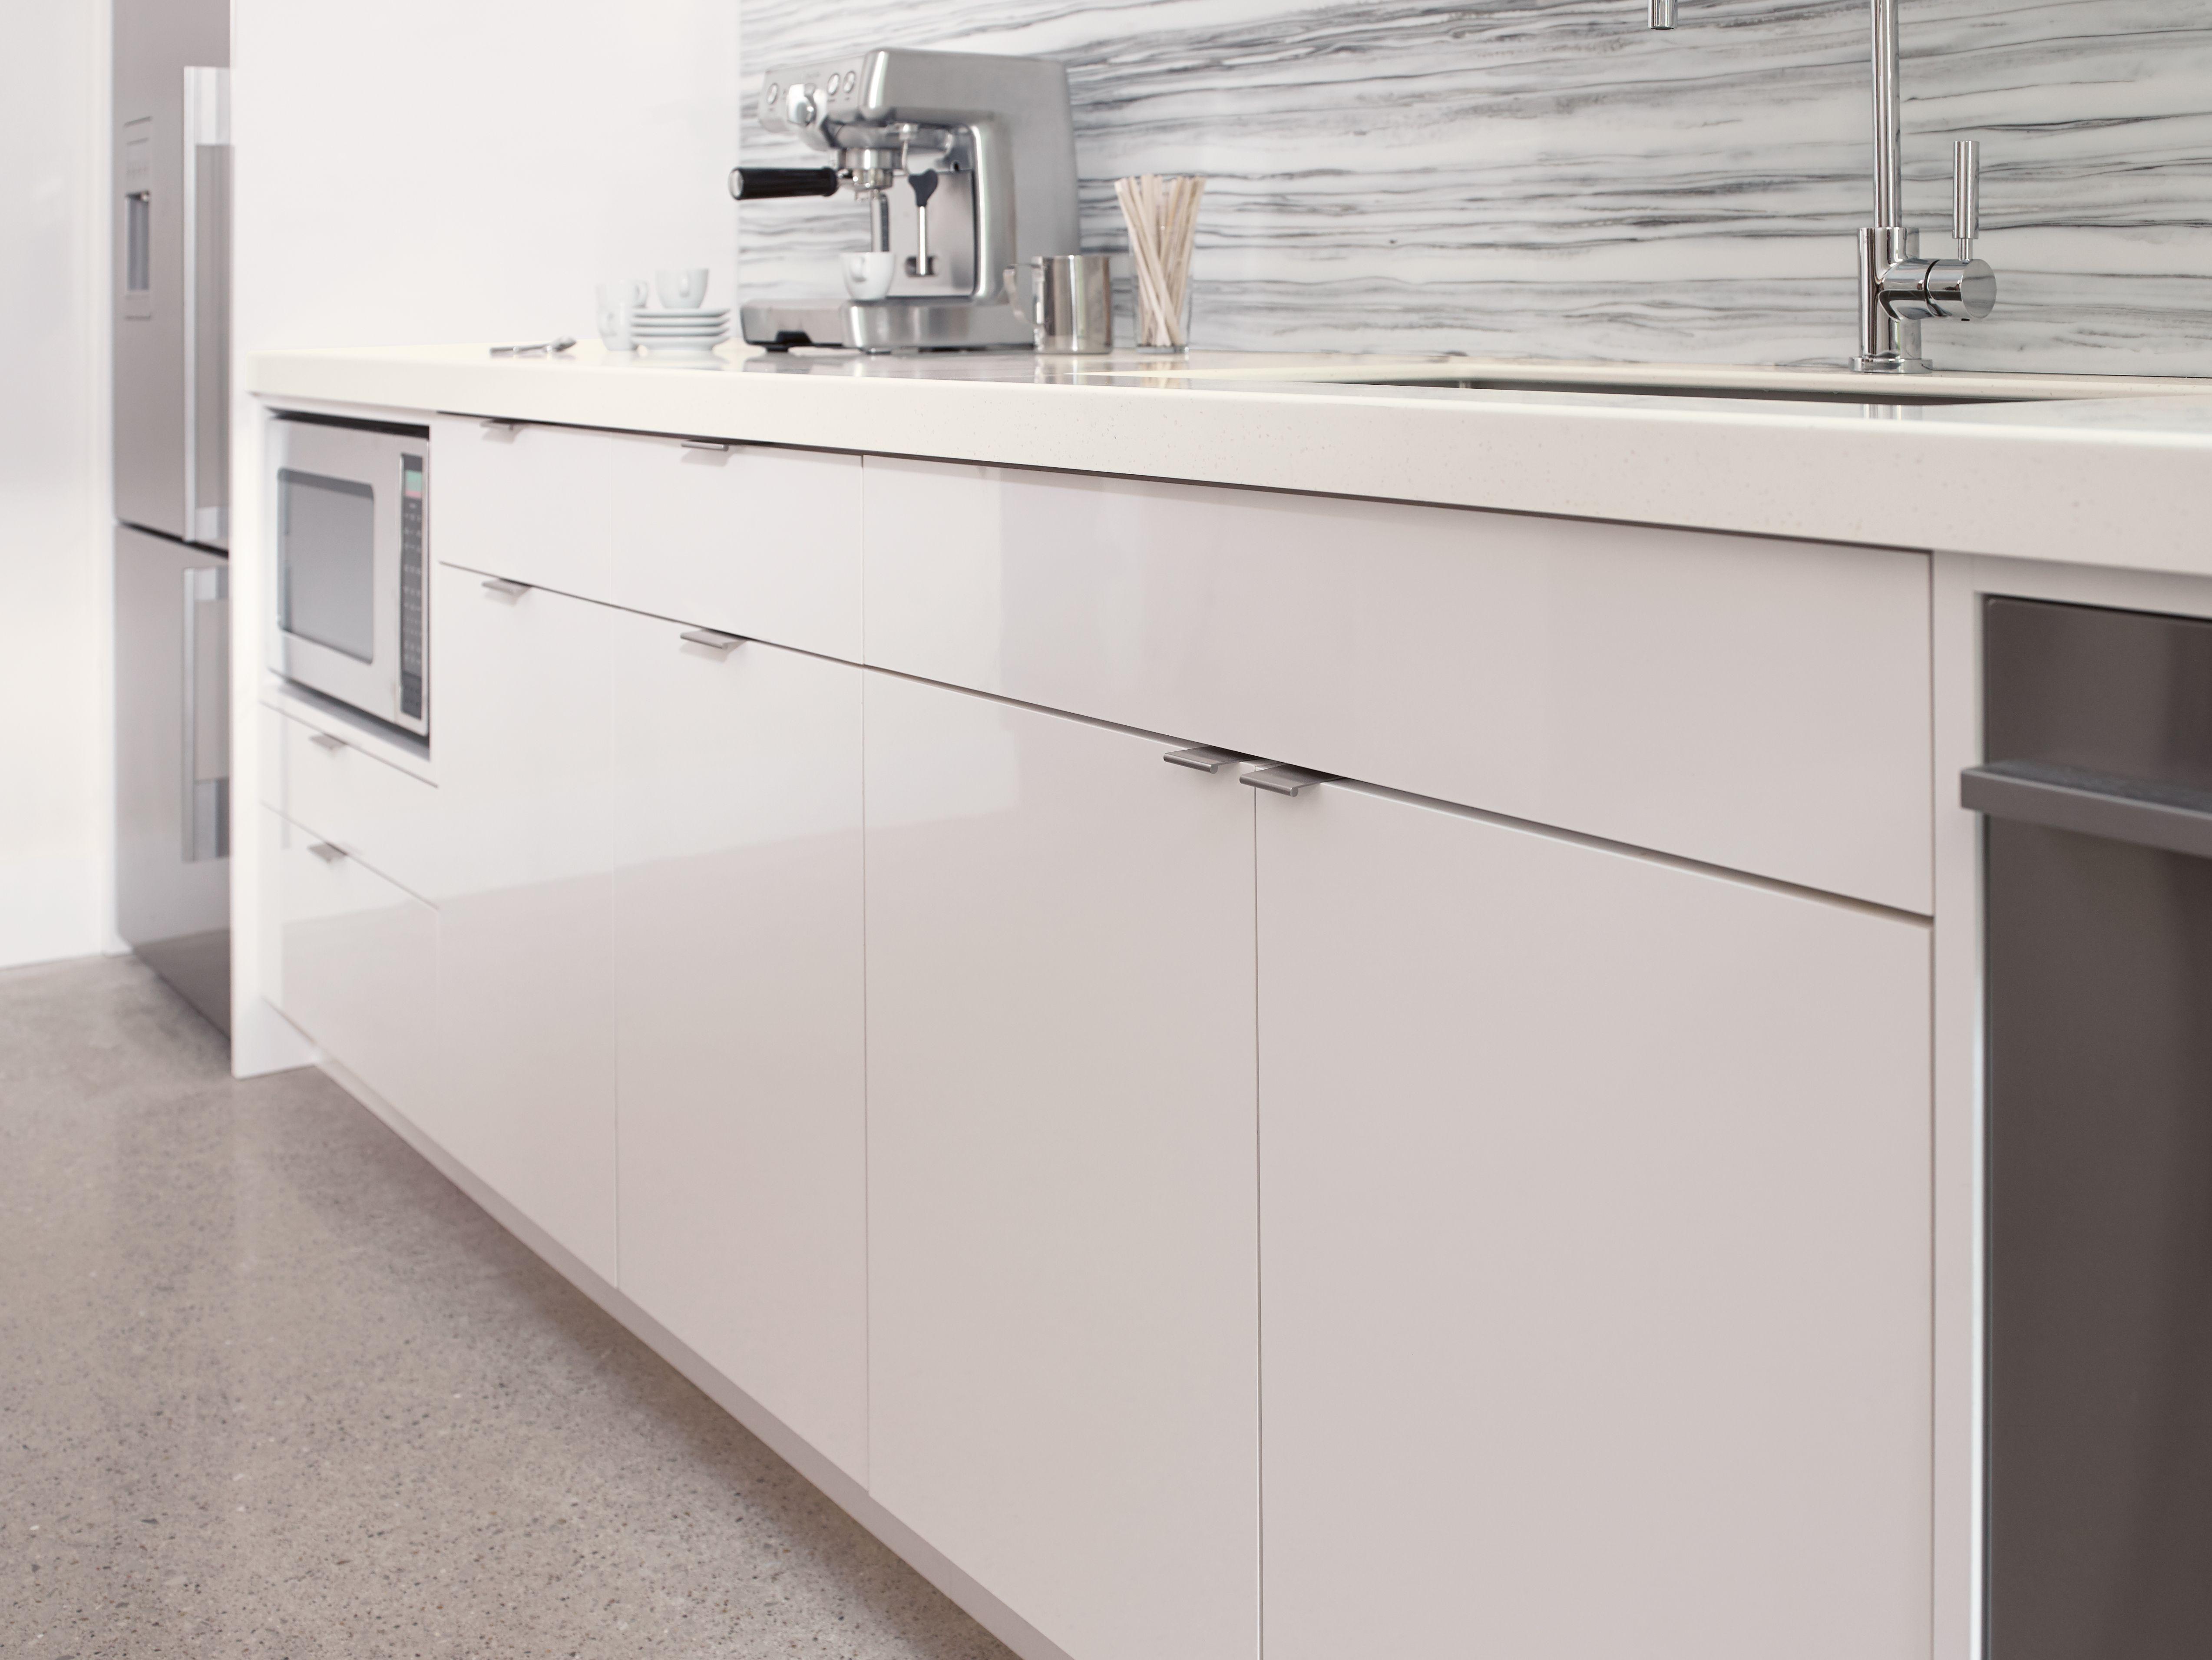 Formica Group - Leading HPL Design, Manufacturing ...